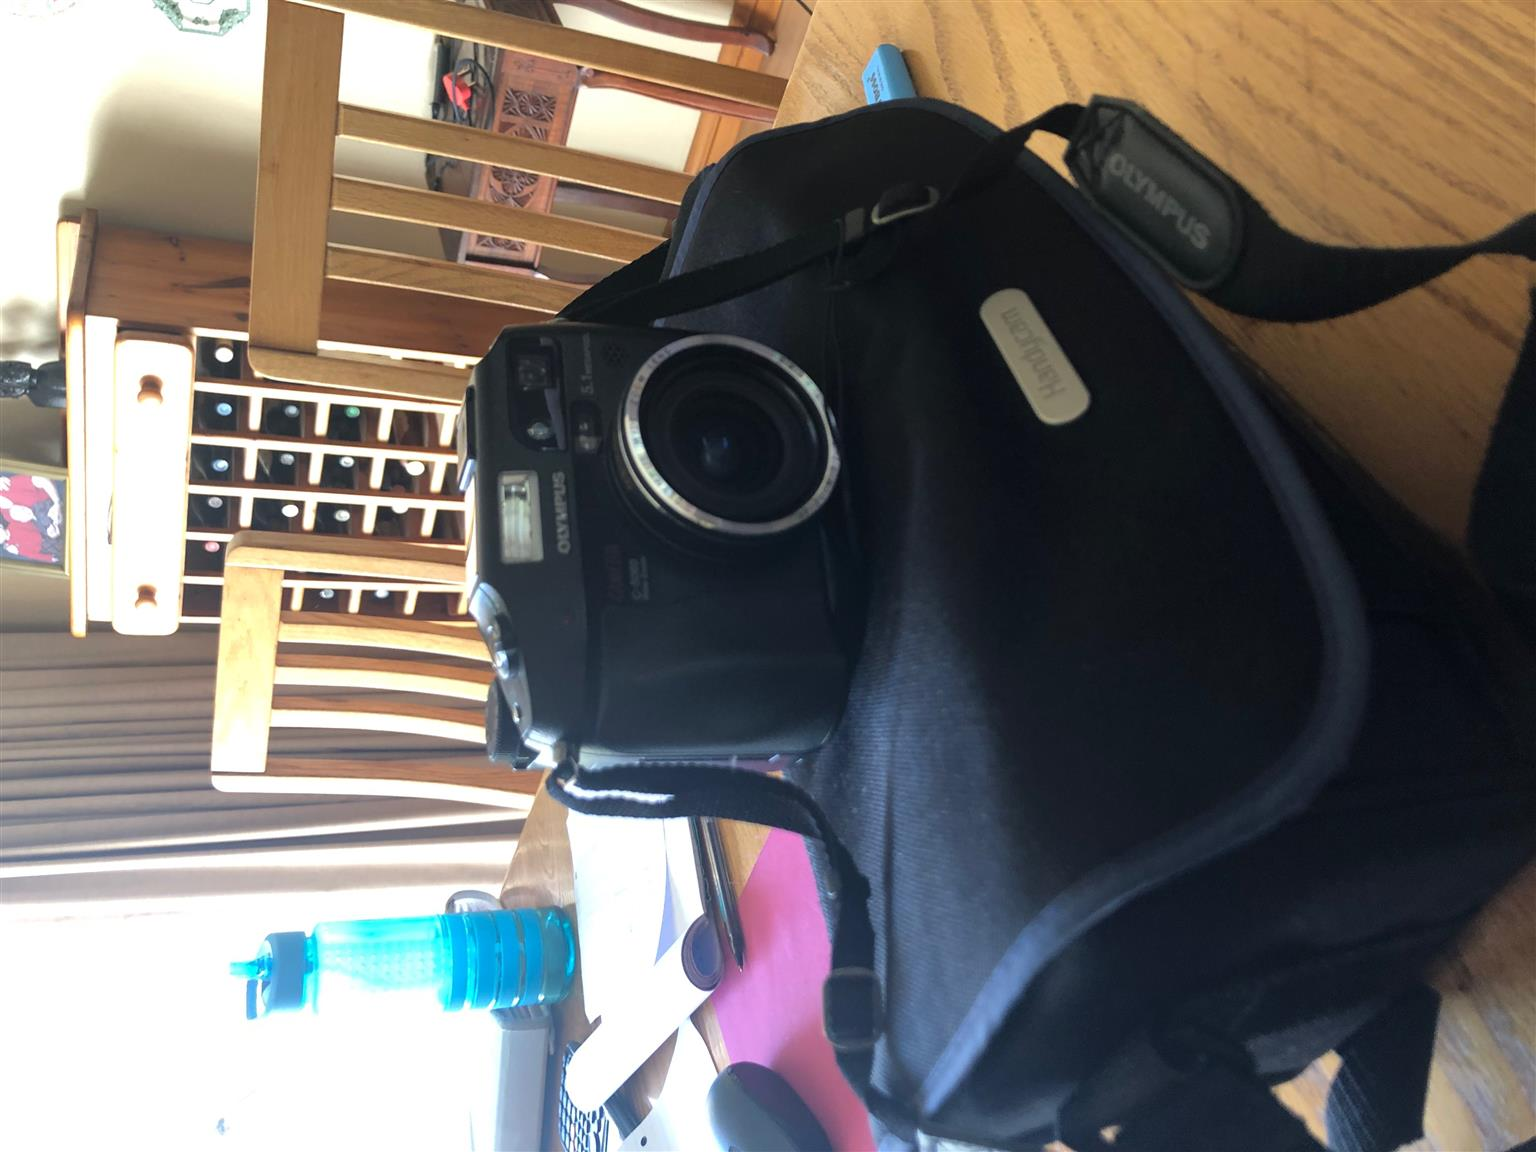 Olympus digital, 5,,1 megapixel camera for sale